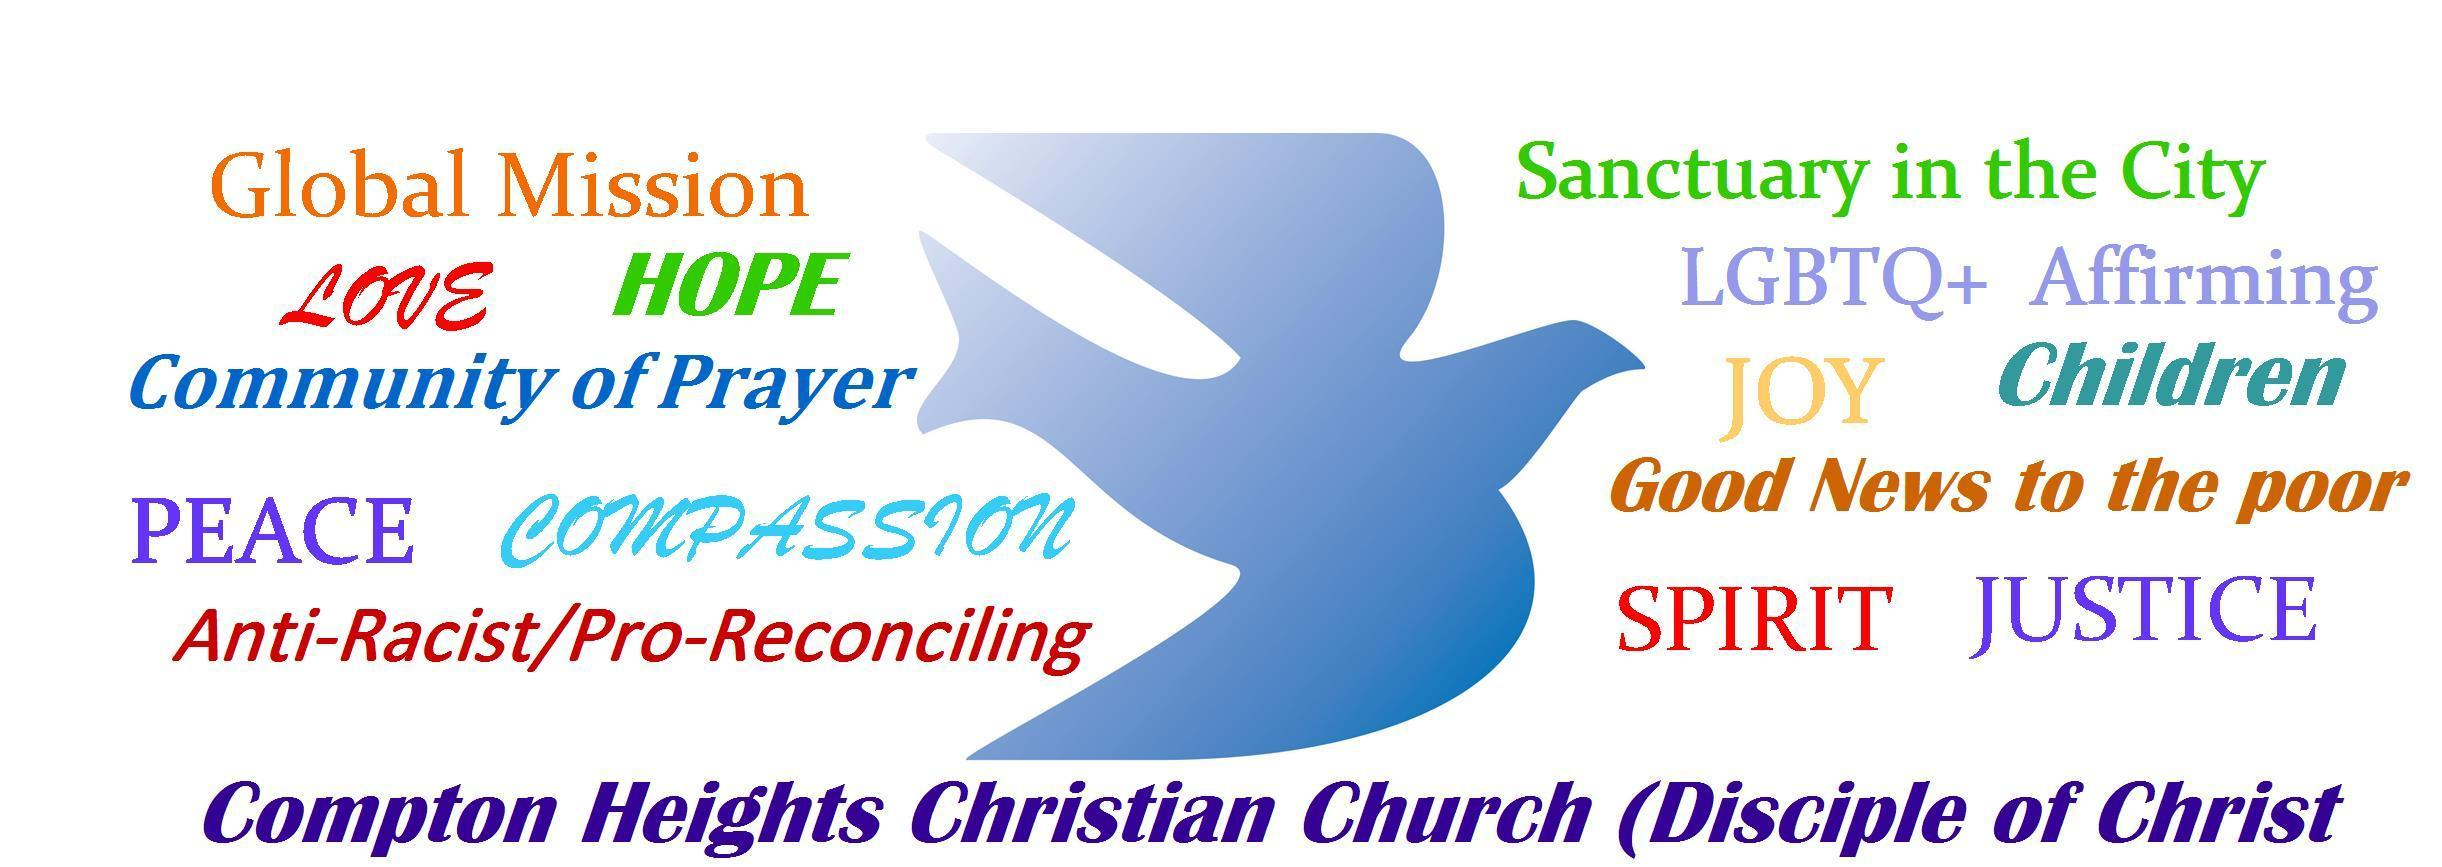 Compton Heights Christian Church